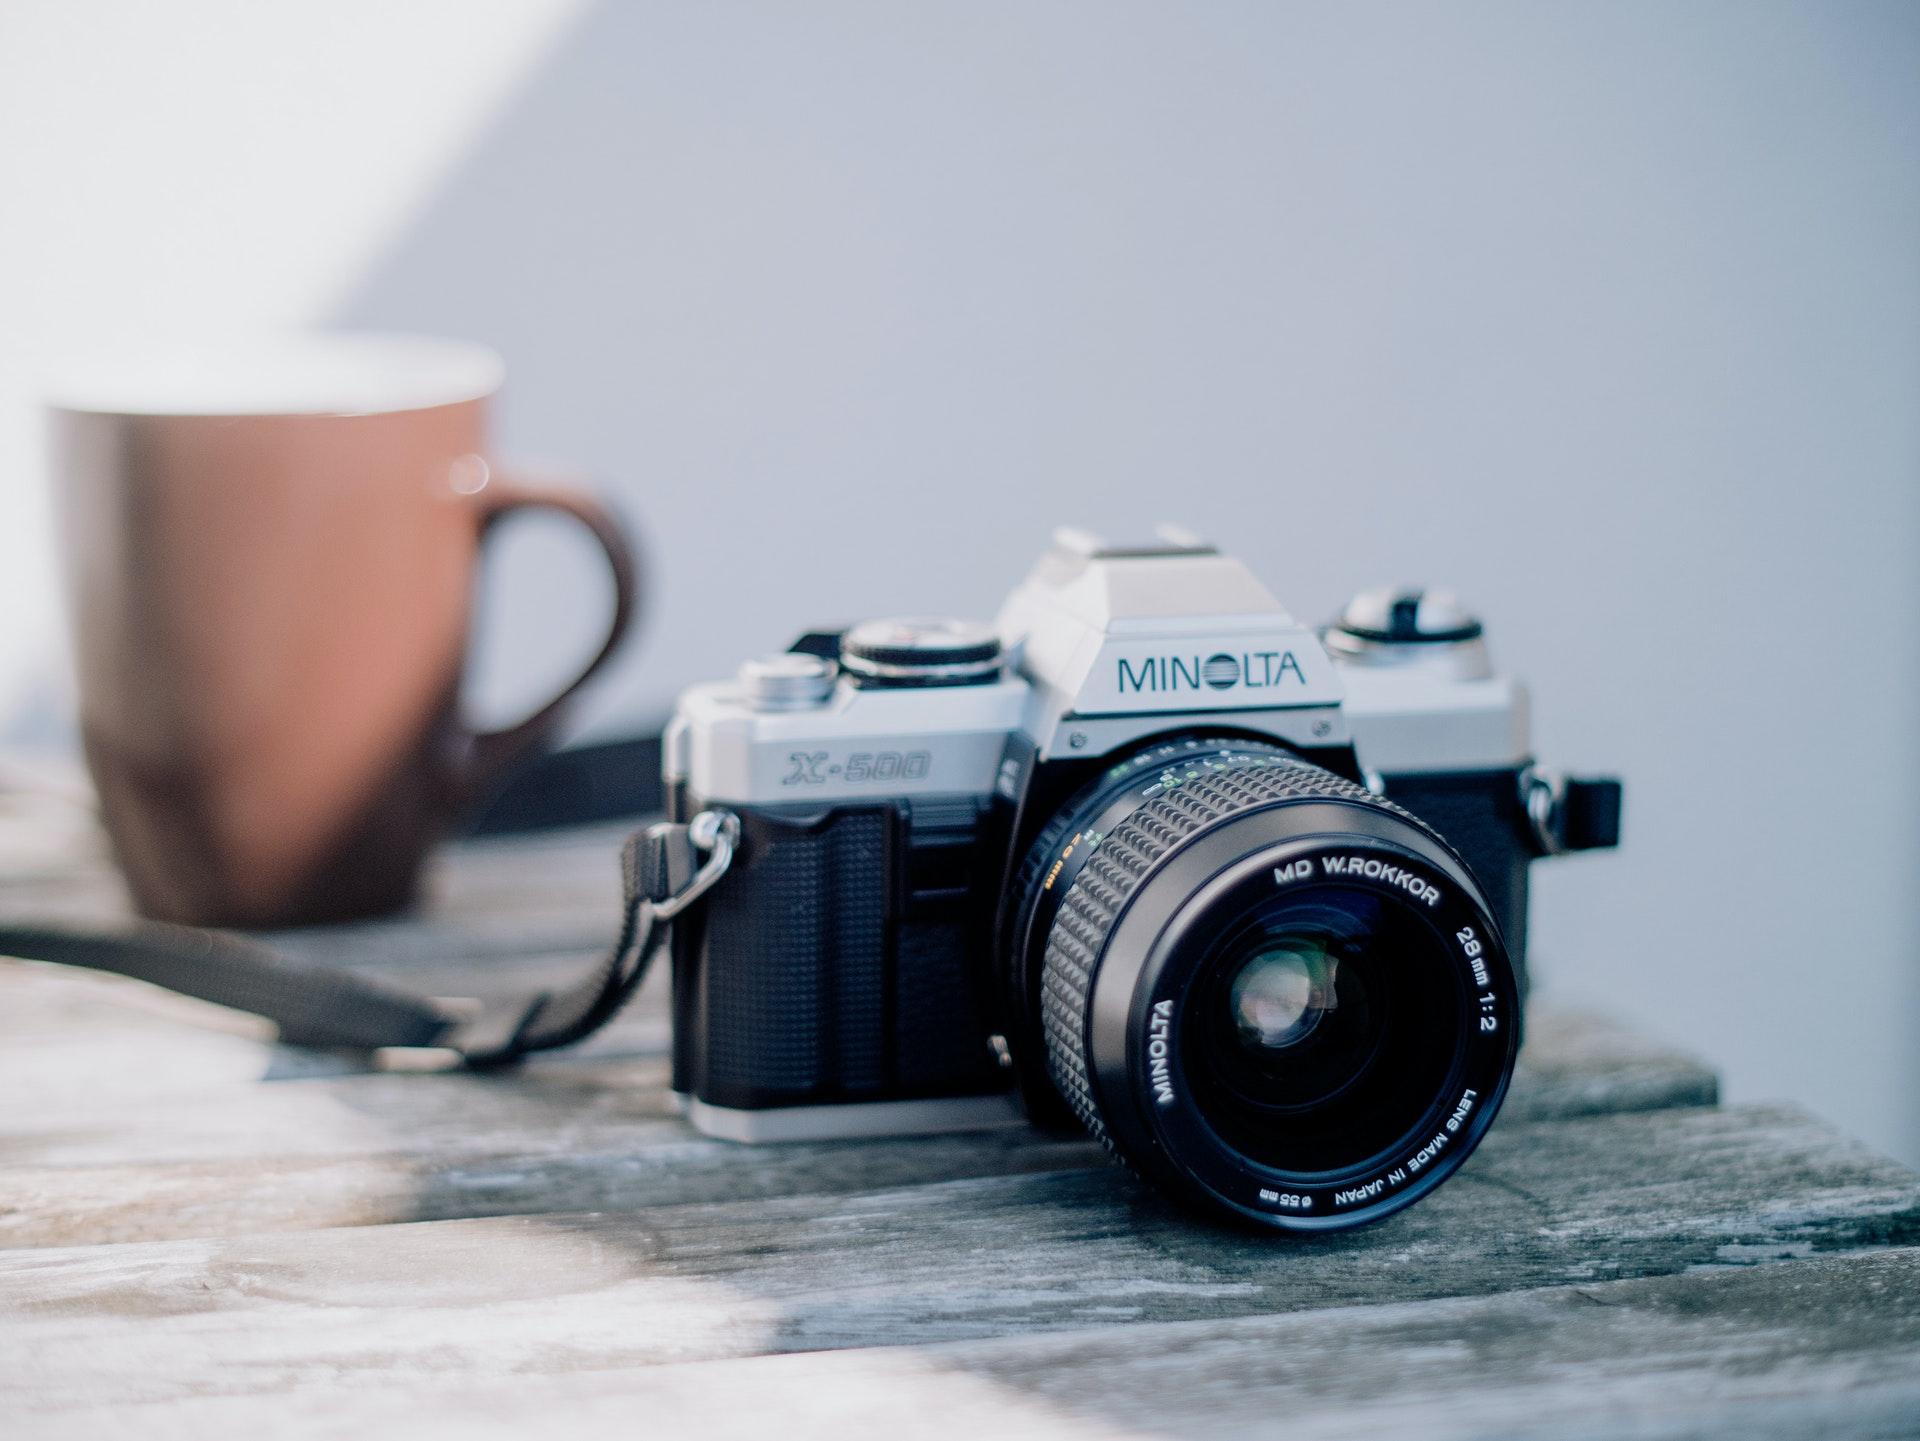 Minolta X-500 and coffee cup (Pic: Patrick Winzler/Pexels)